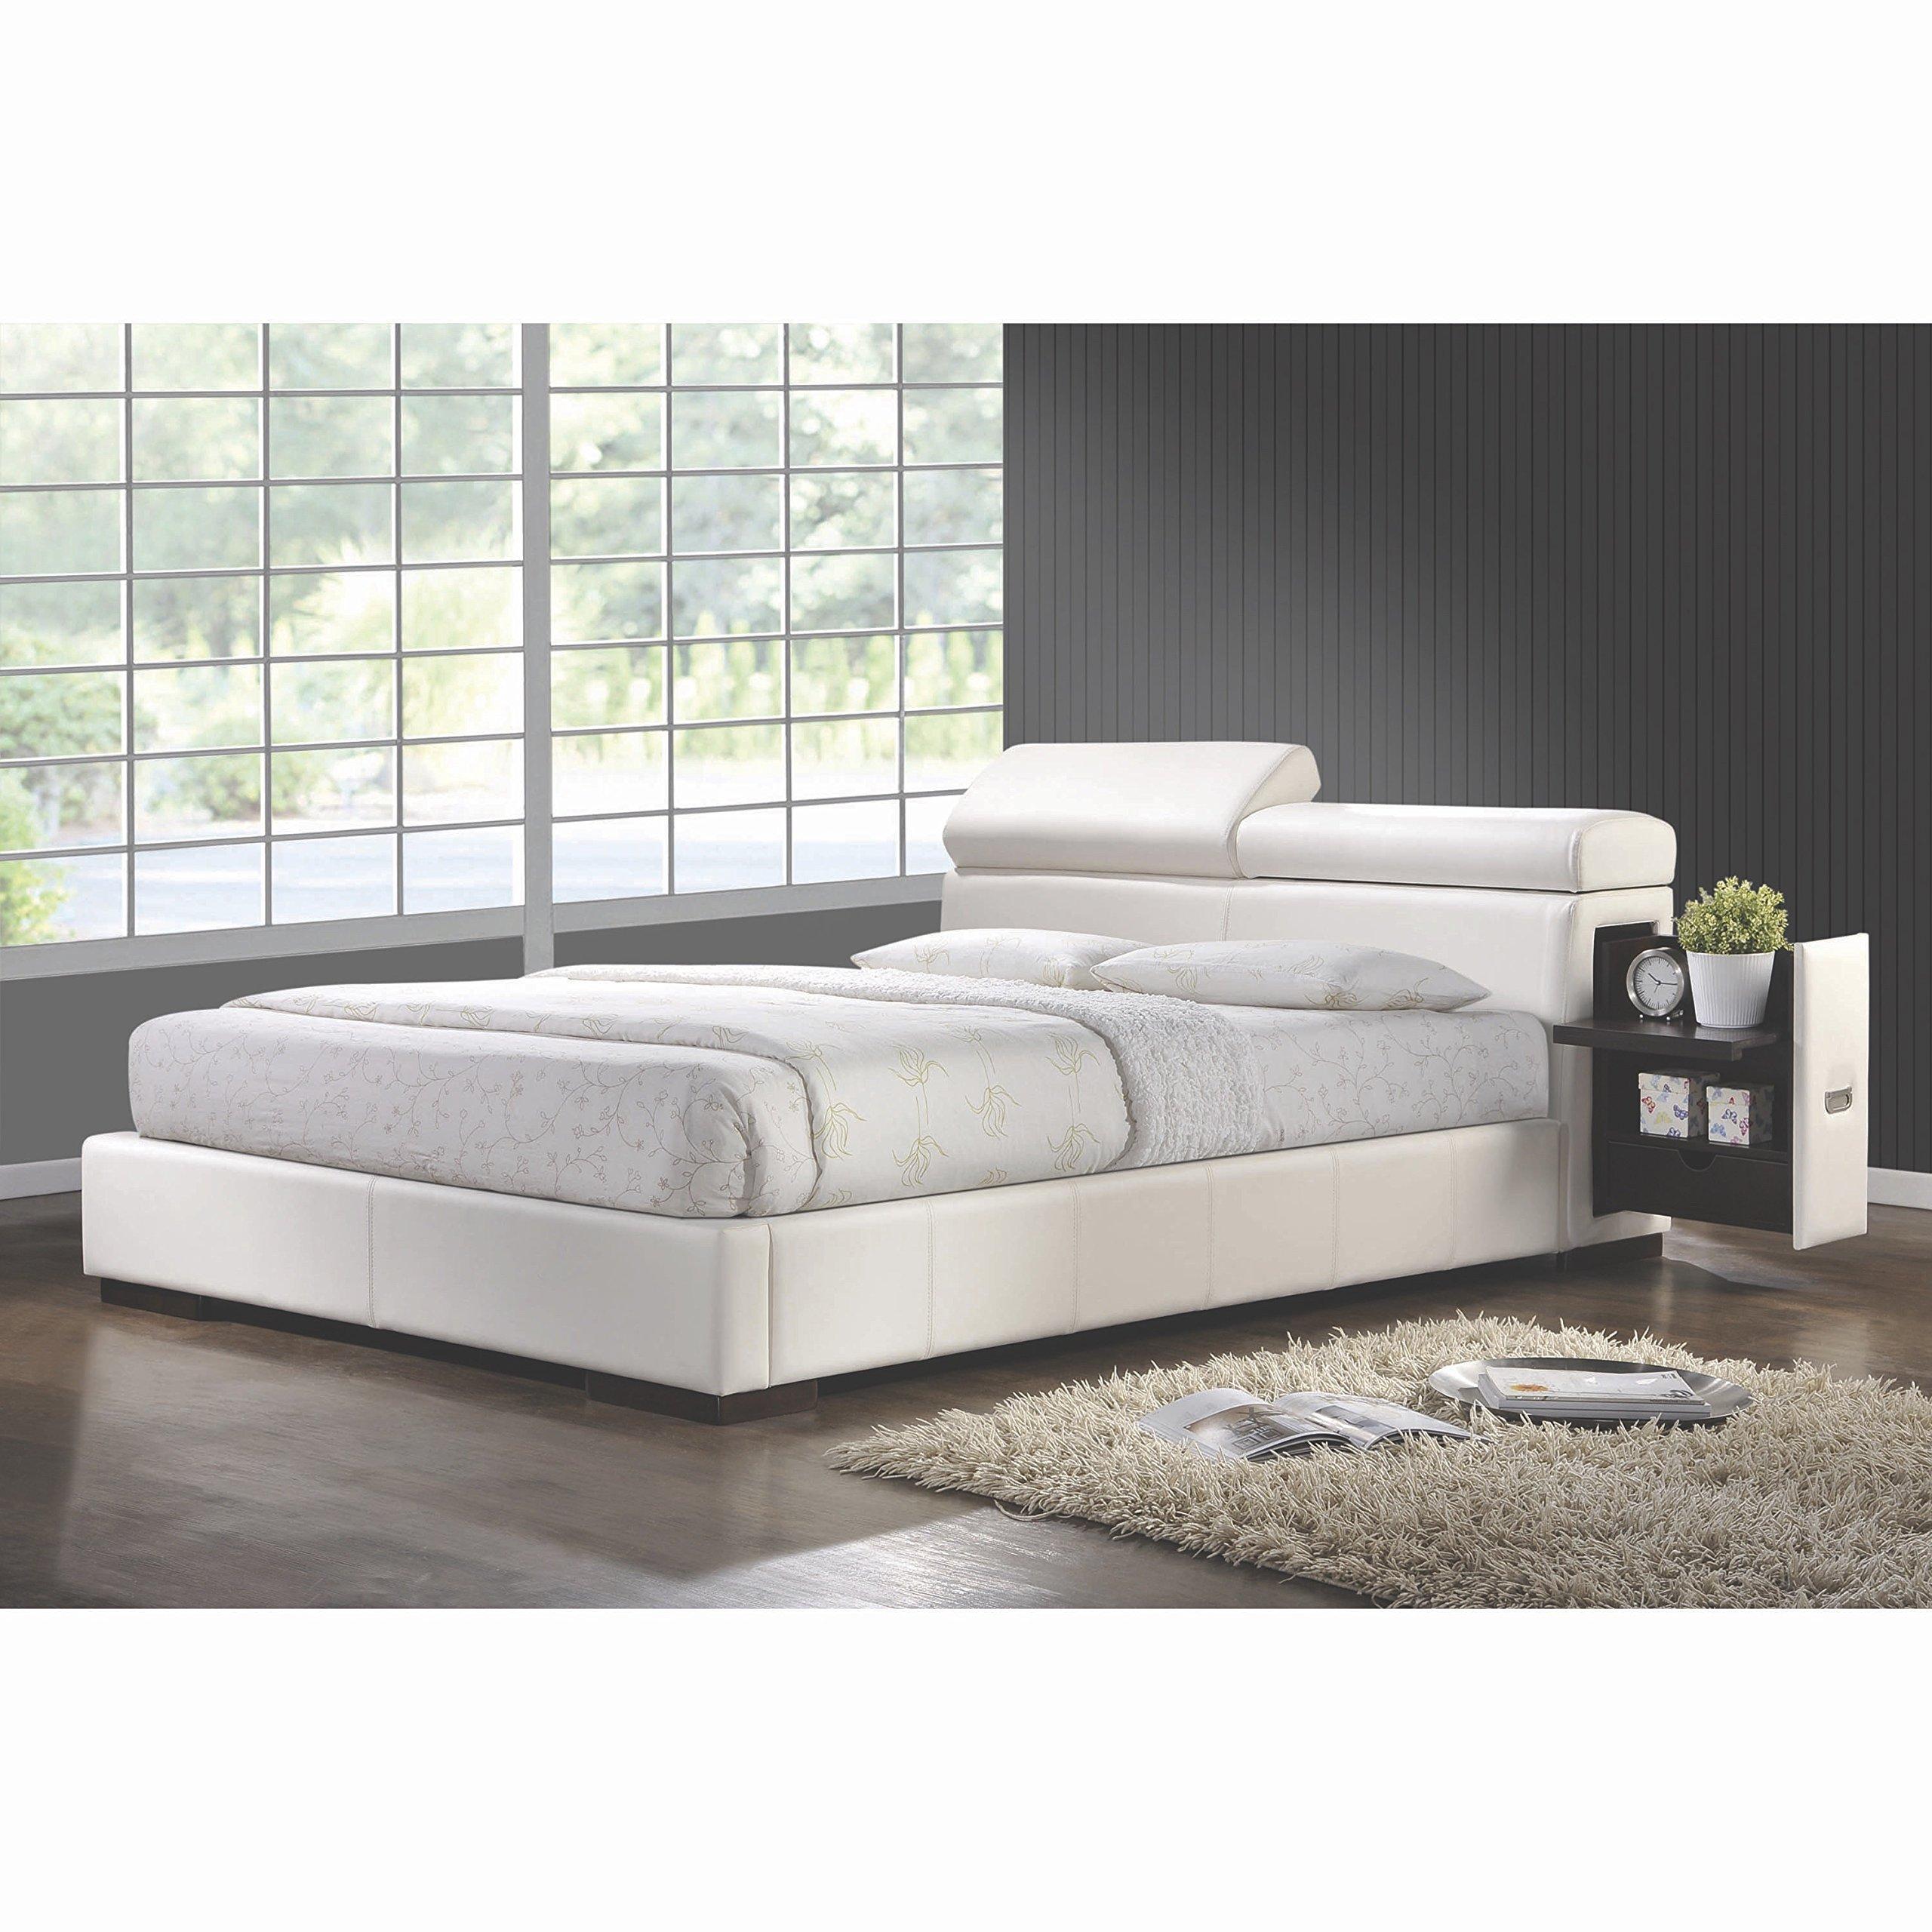 Coaster Home Furnishings 300379KE Contemporary Bed, King, White/White